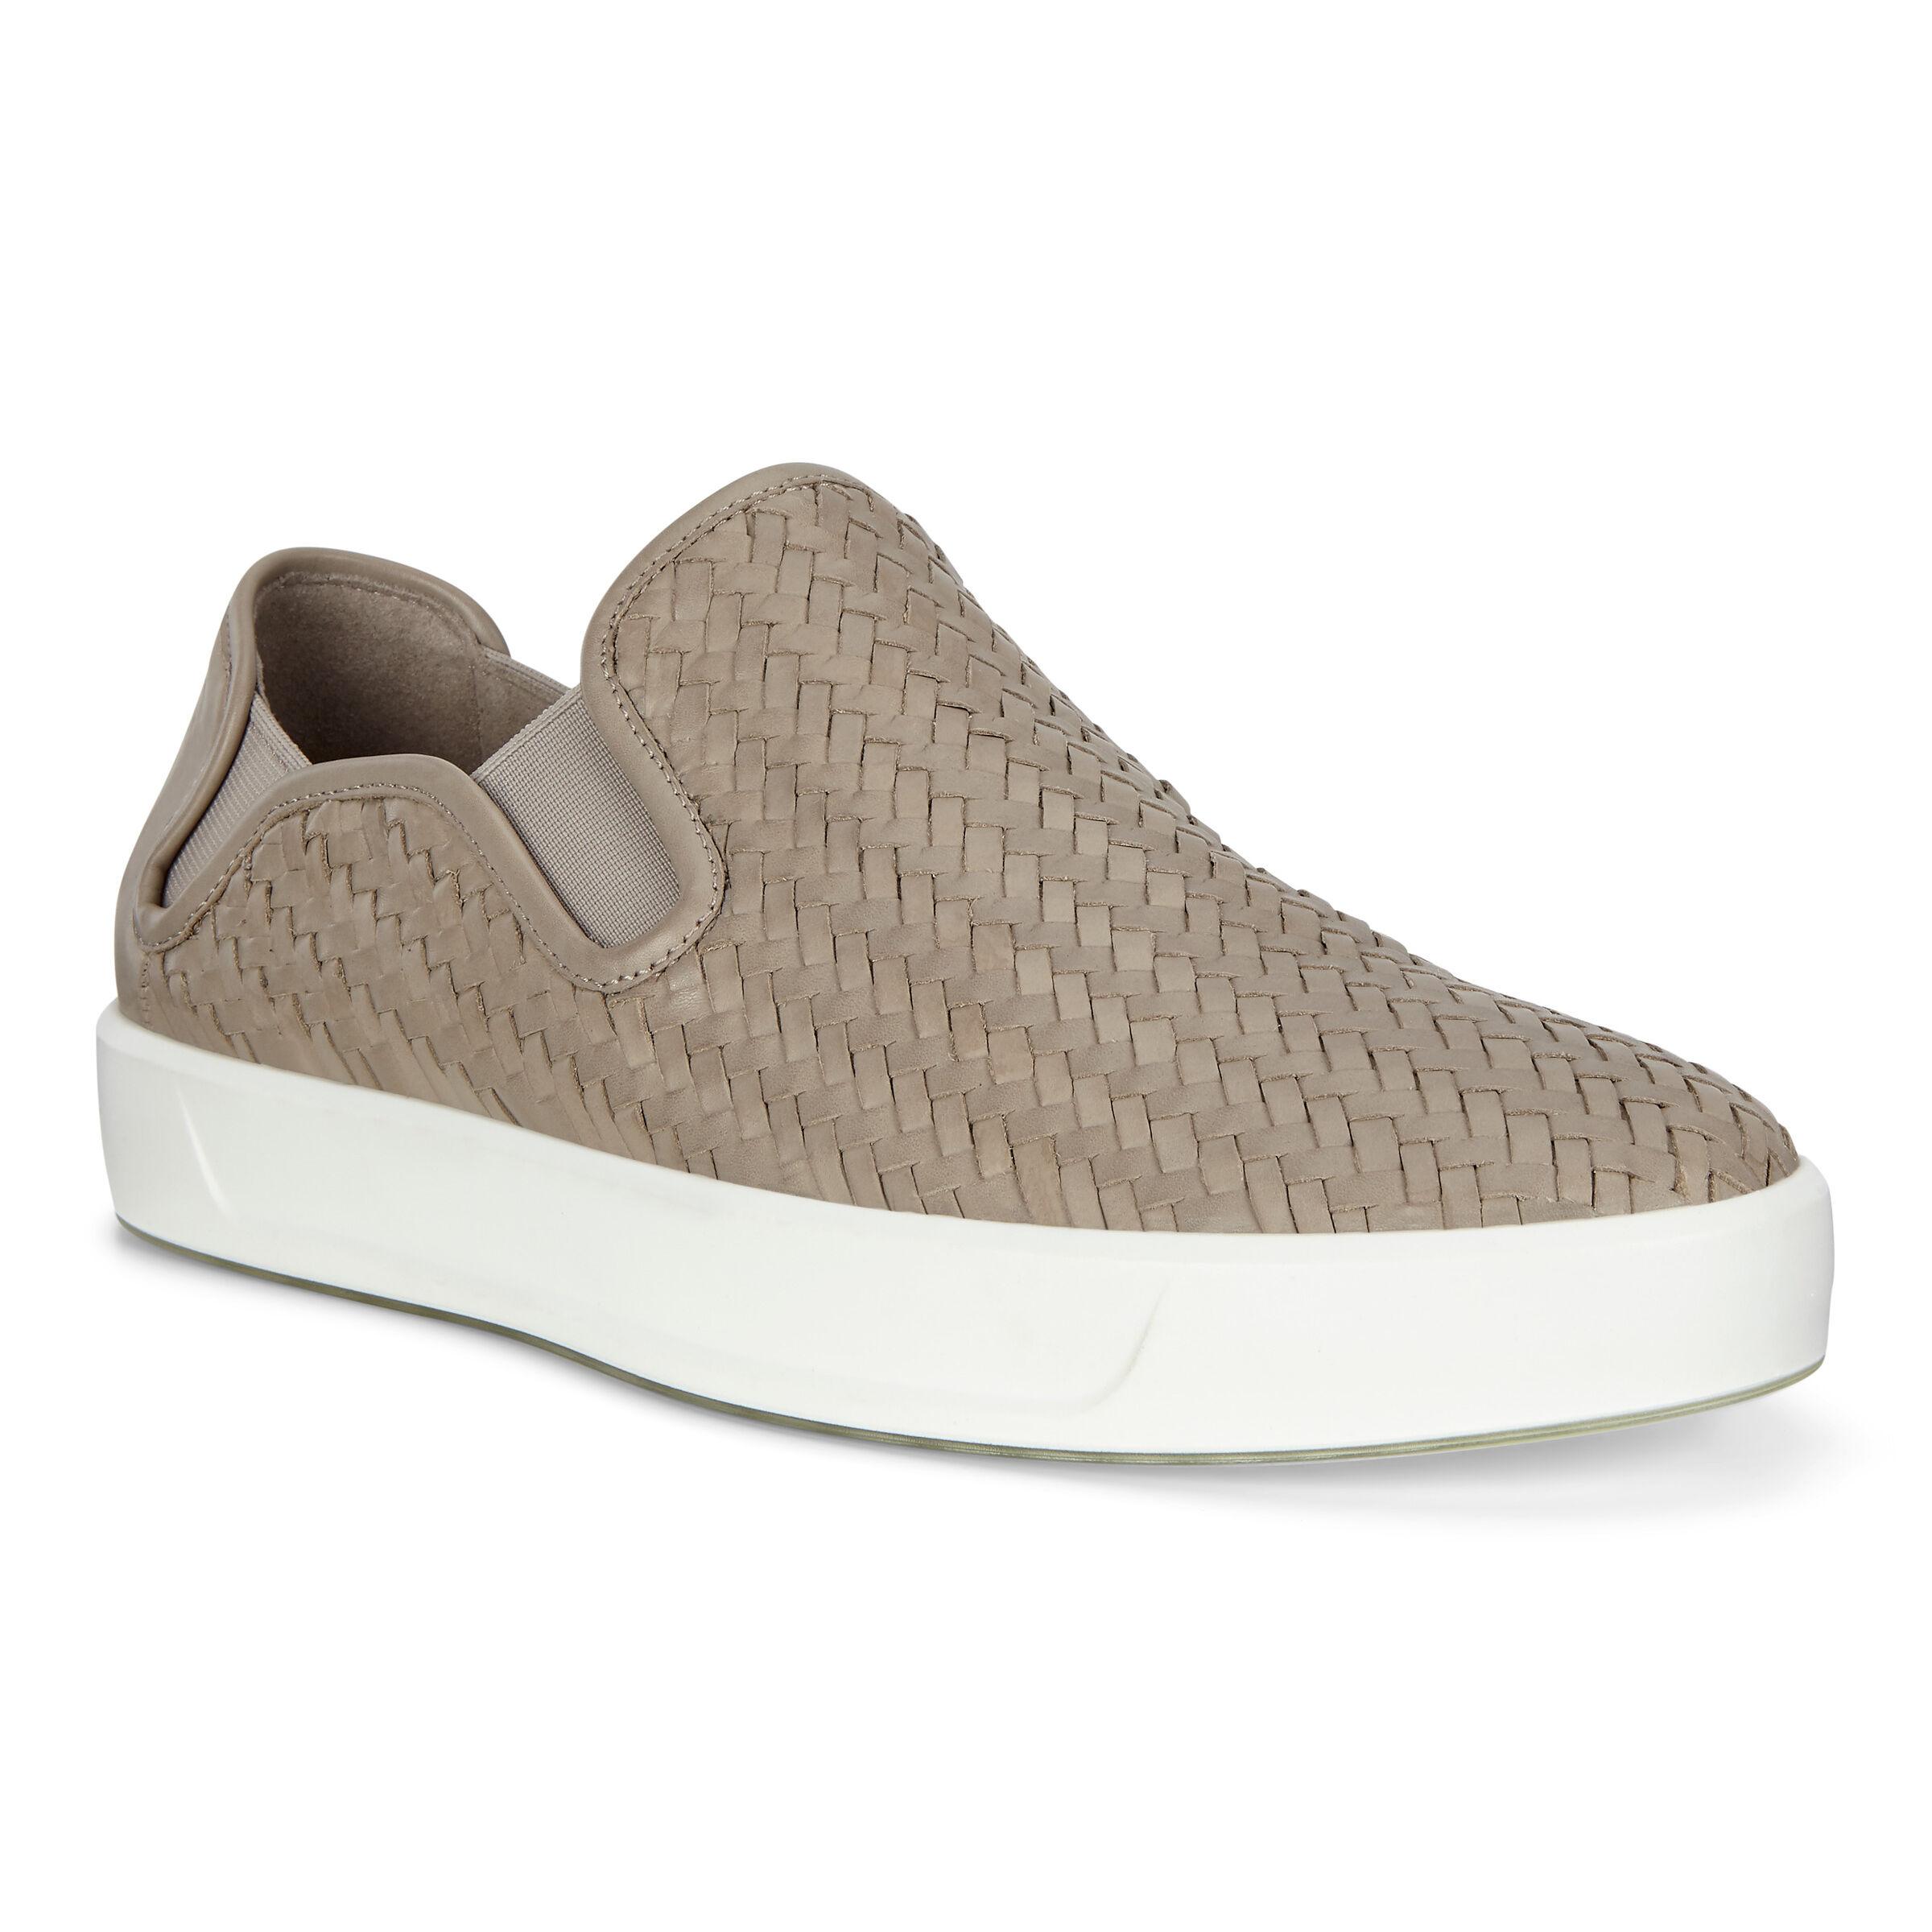 ECCO Soft 8 Mens Slip-on Sneaker